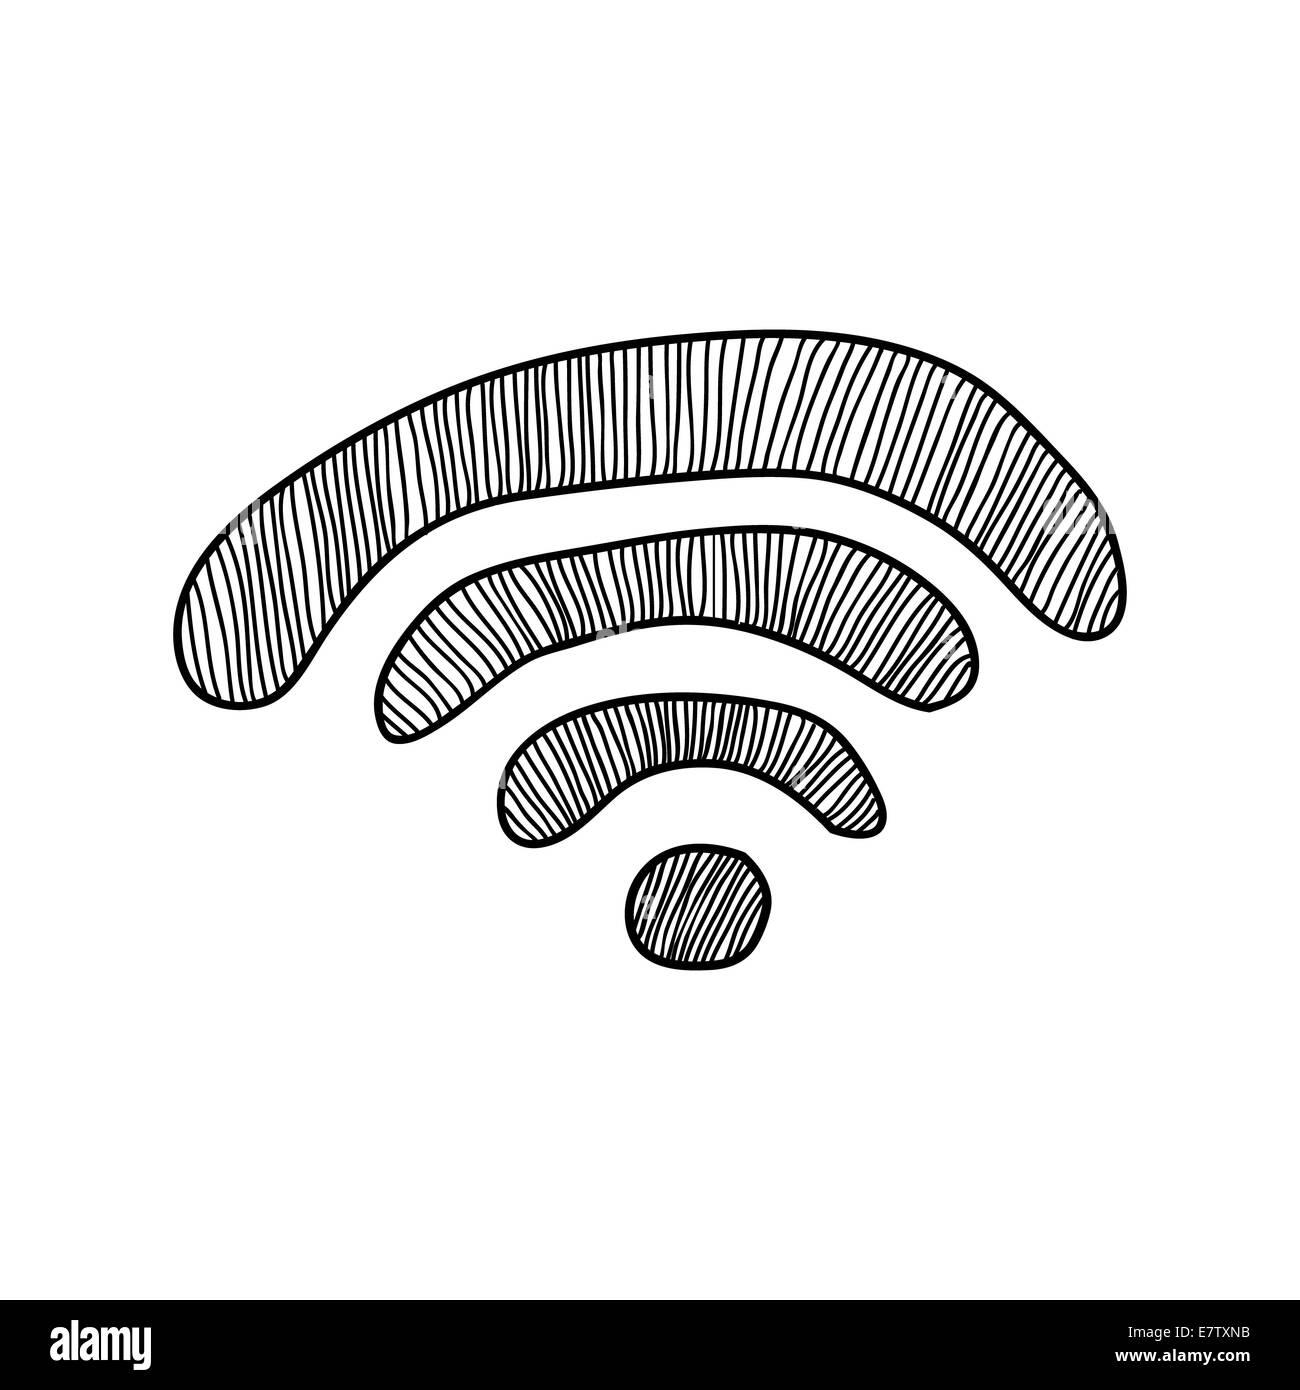 Doodle señal Wi-Fi Imagen De Stock